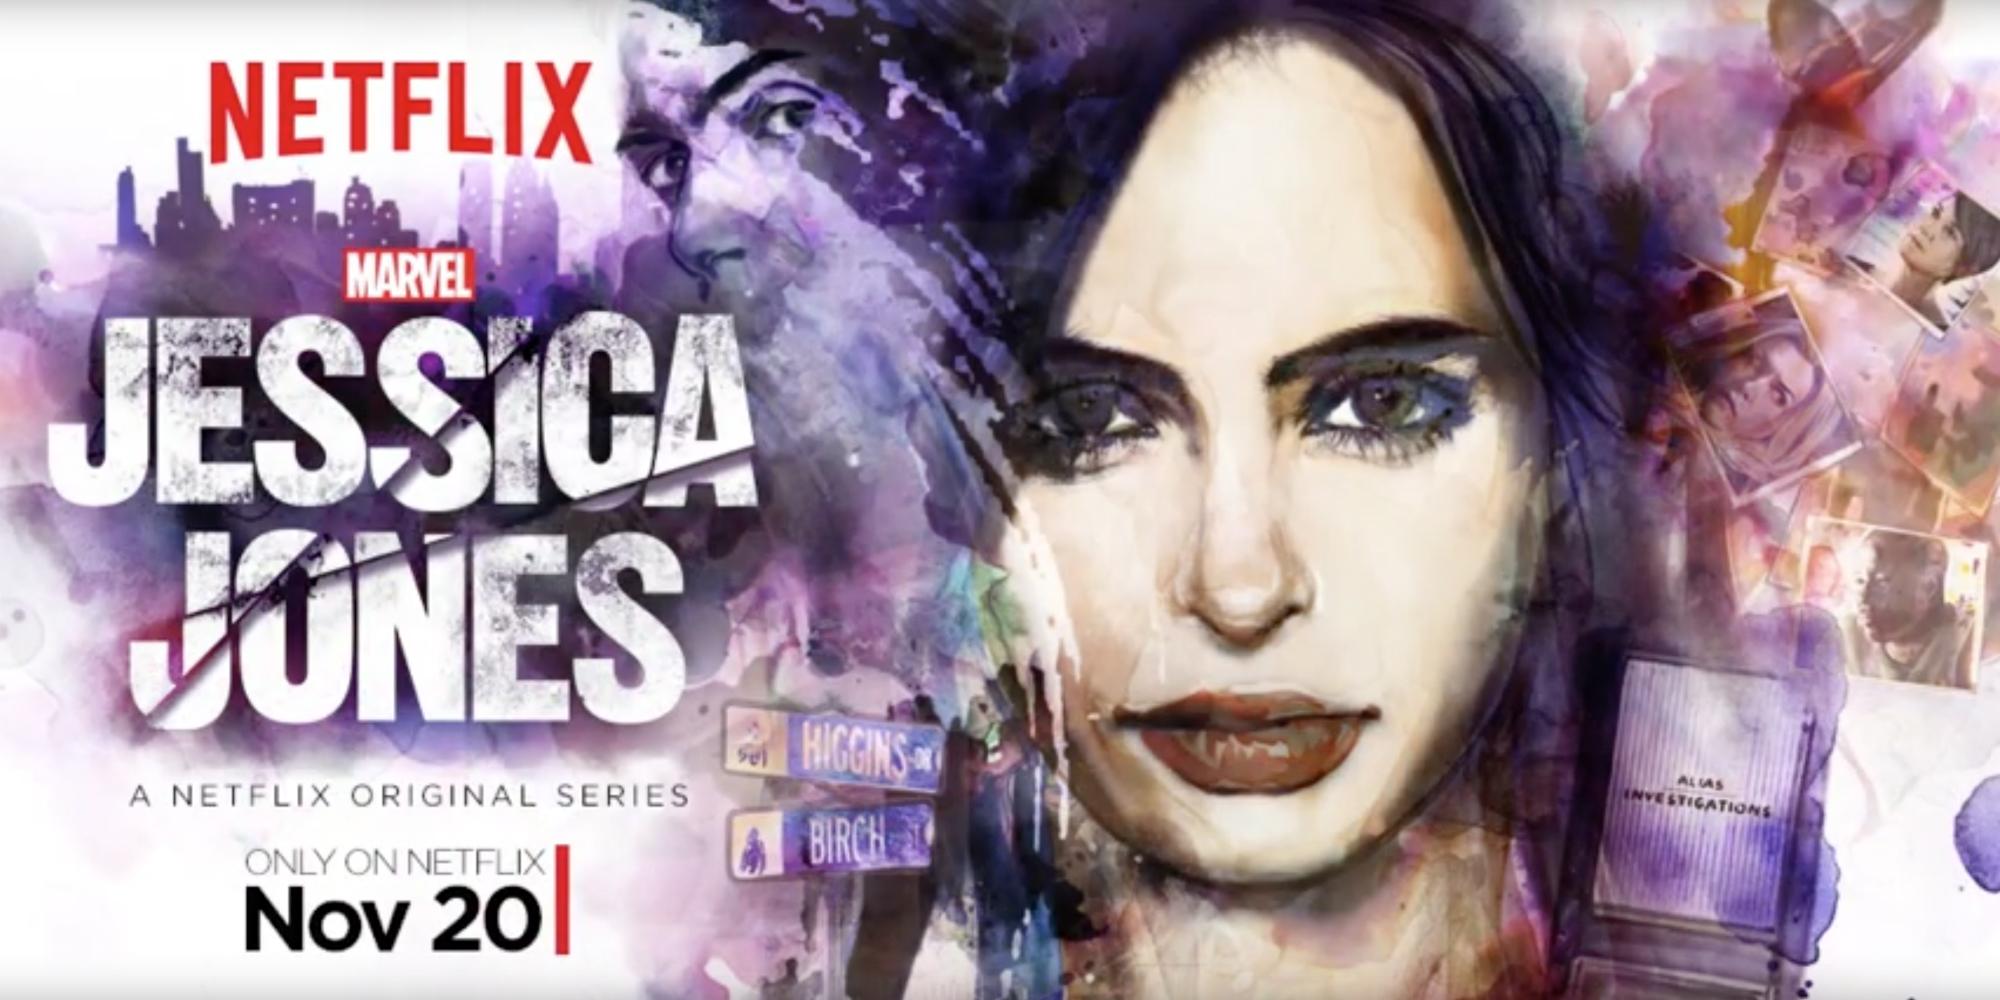 Netflix Round-Up: Jessica Jones